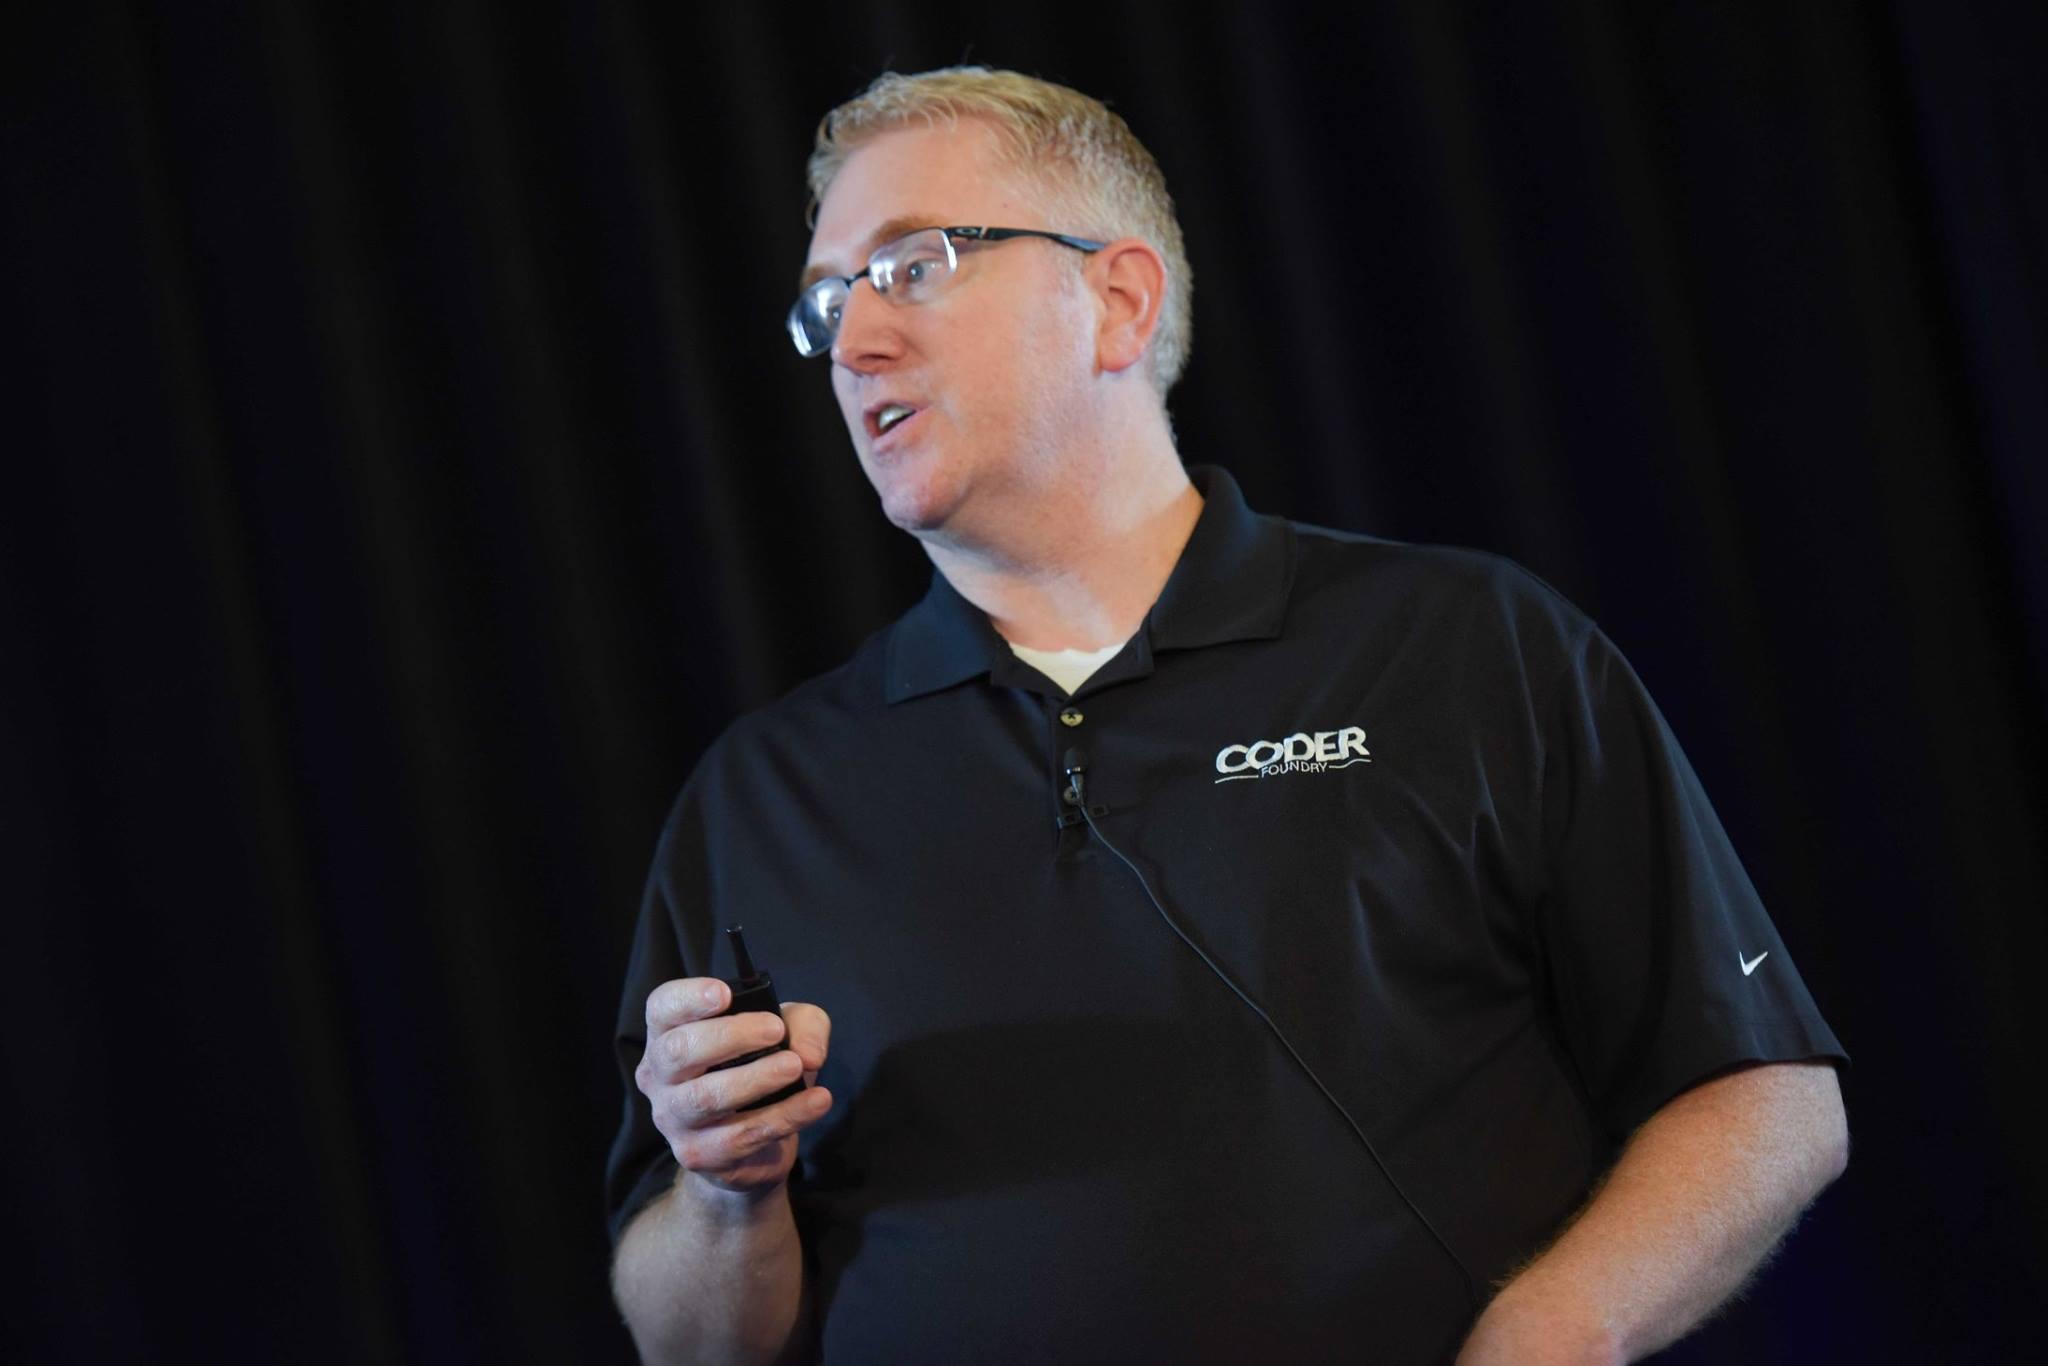 Bobby Davis, founder of Coder Foundry